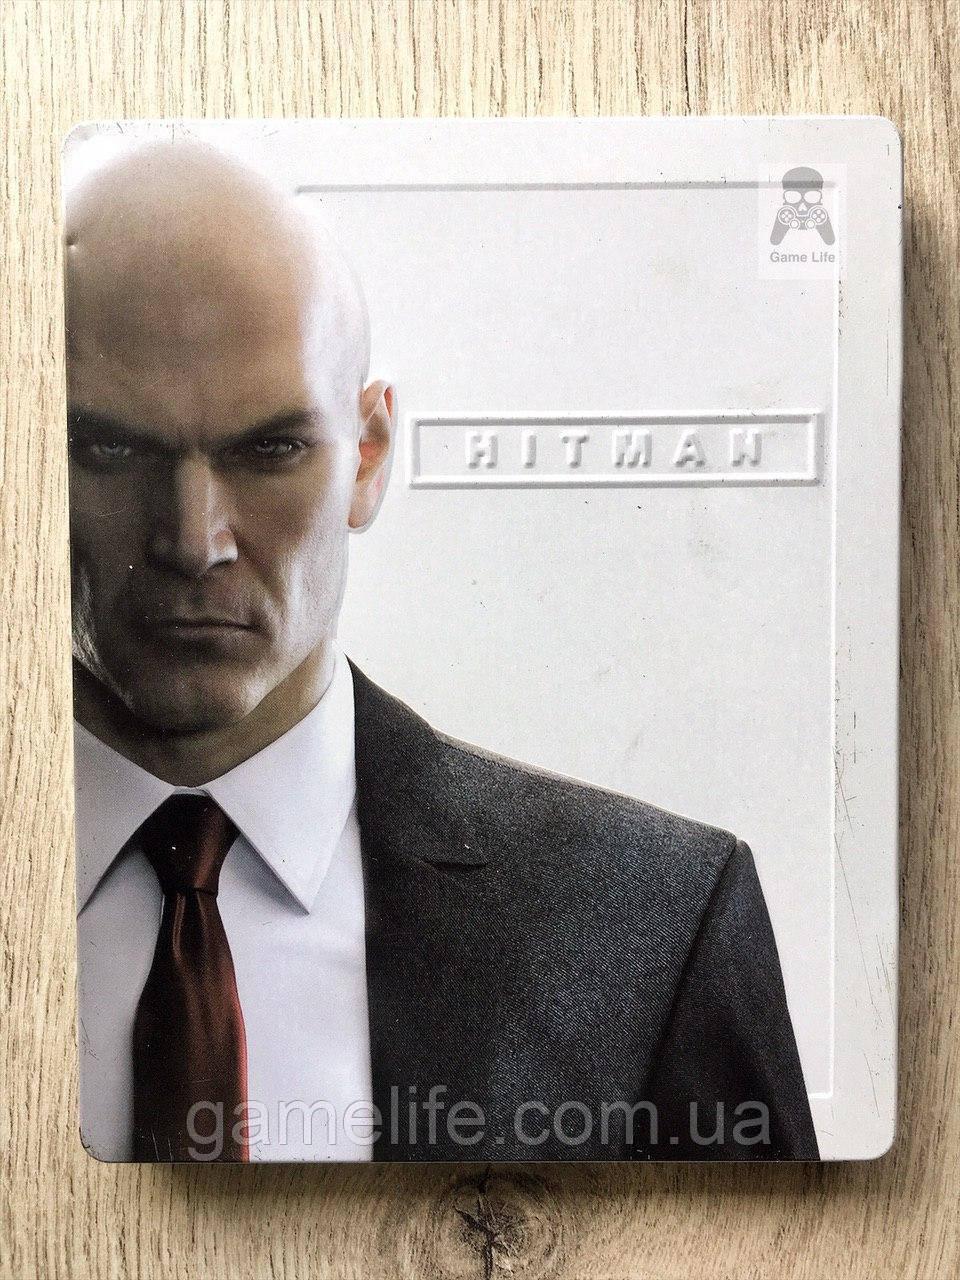 Hitman First Season Steelbook (рус. суб.) (б/у) PS4